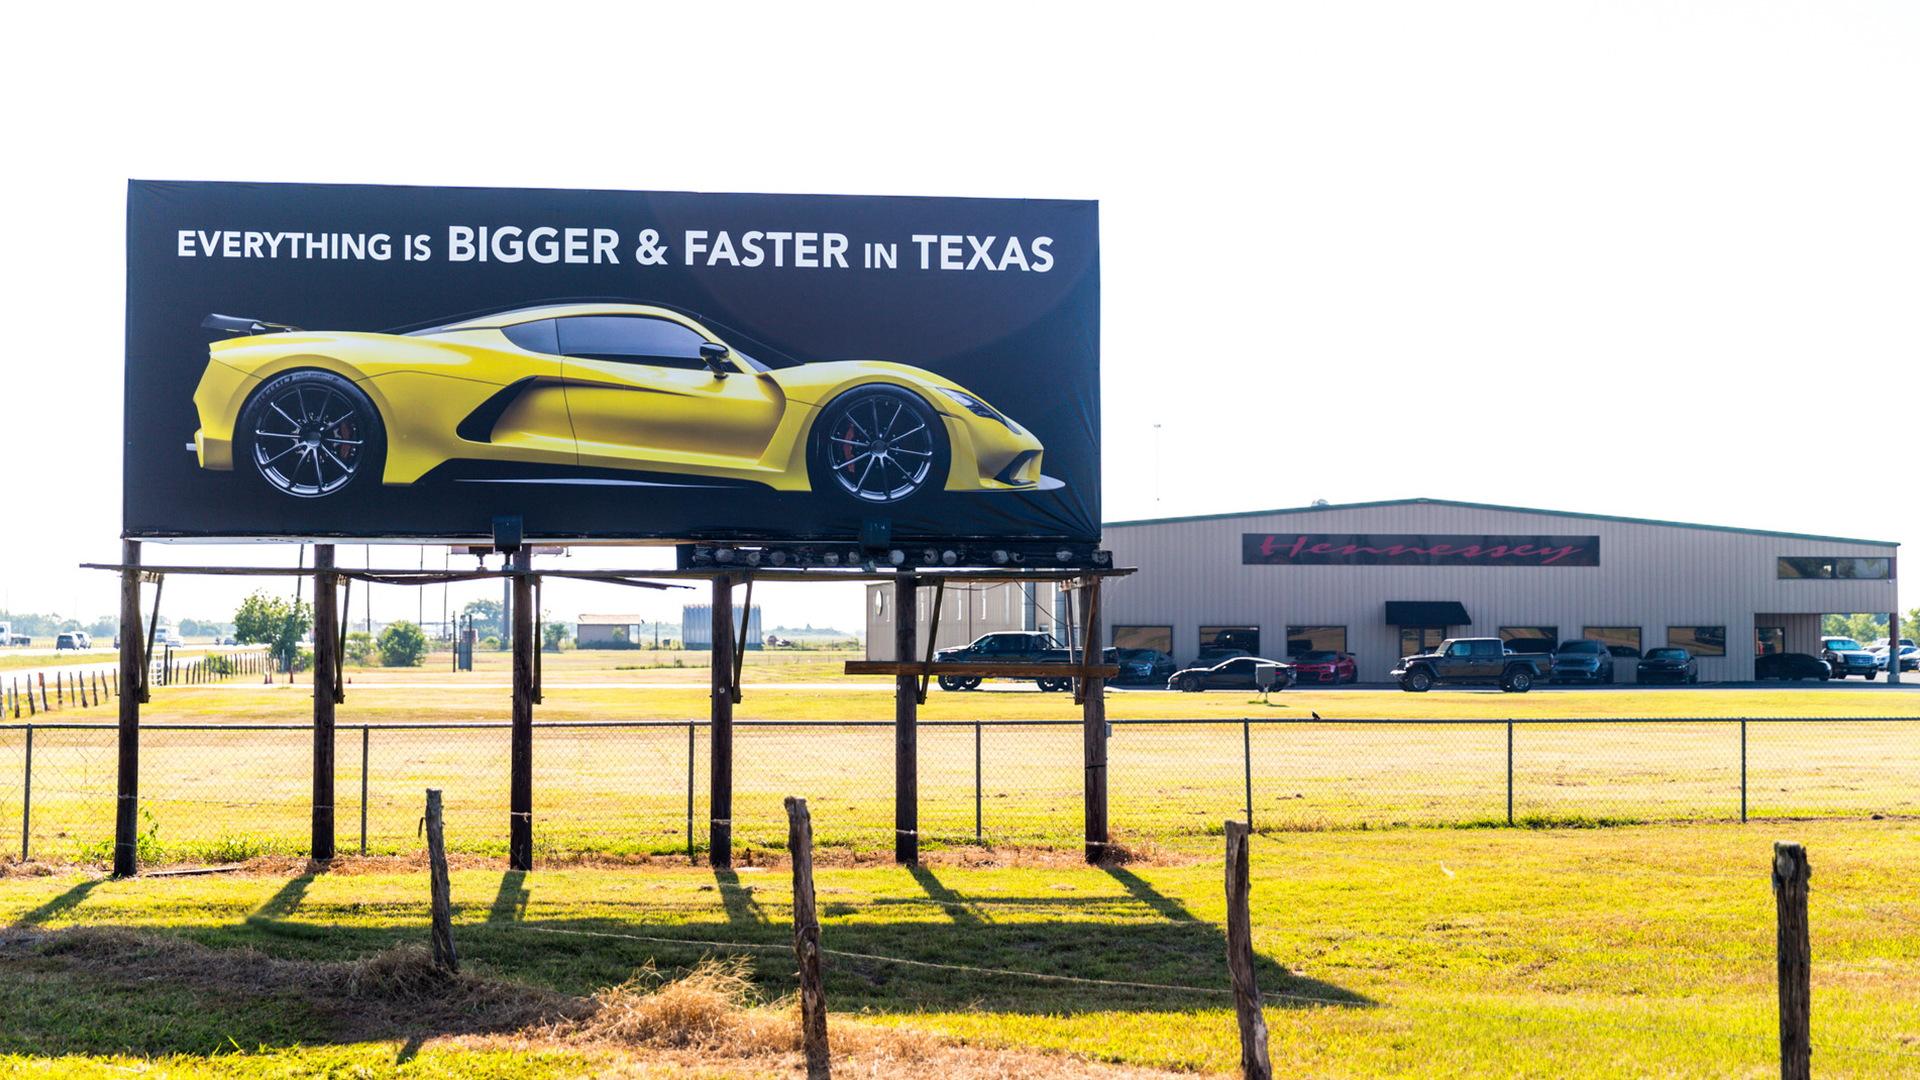 HennesseyPerformance Engineering factory in Sealy, Texas